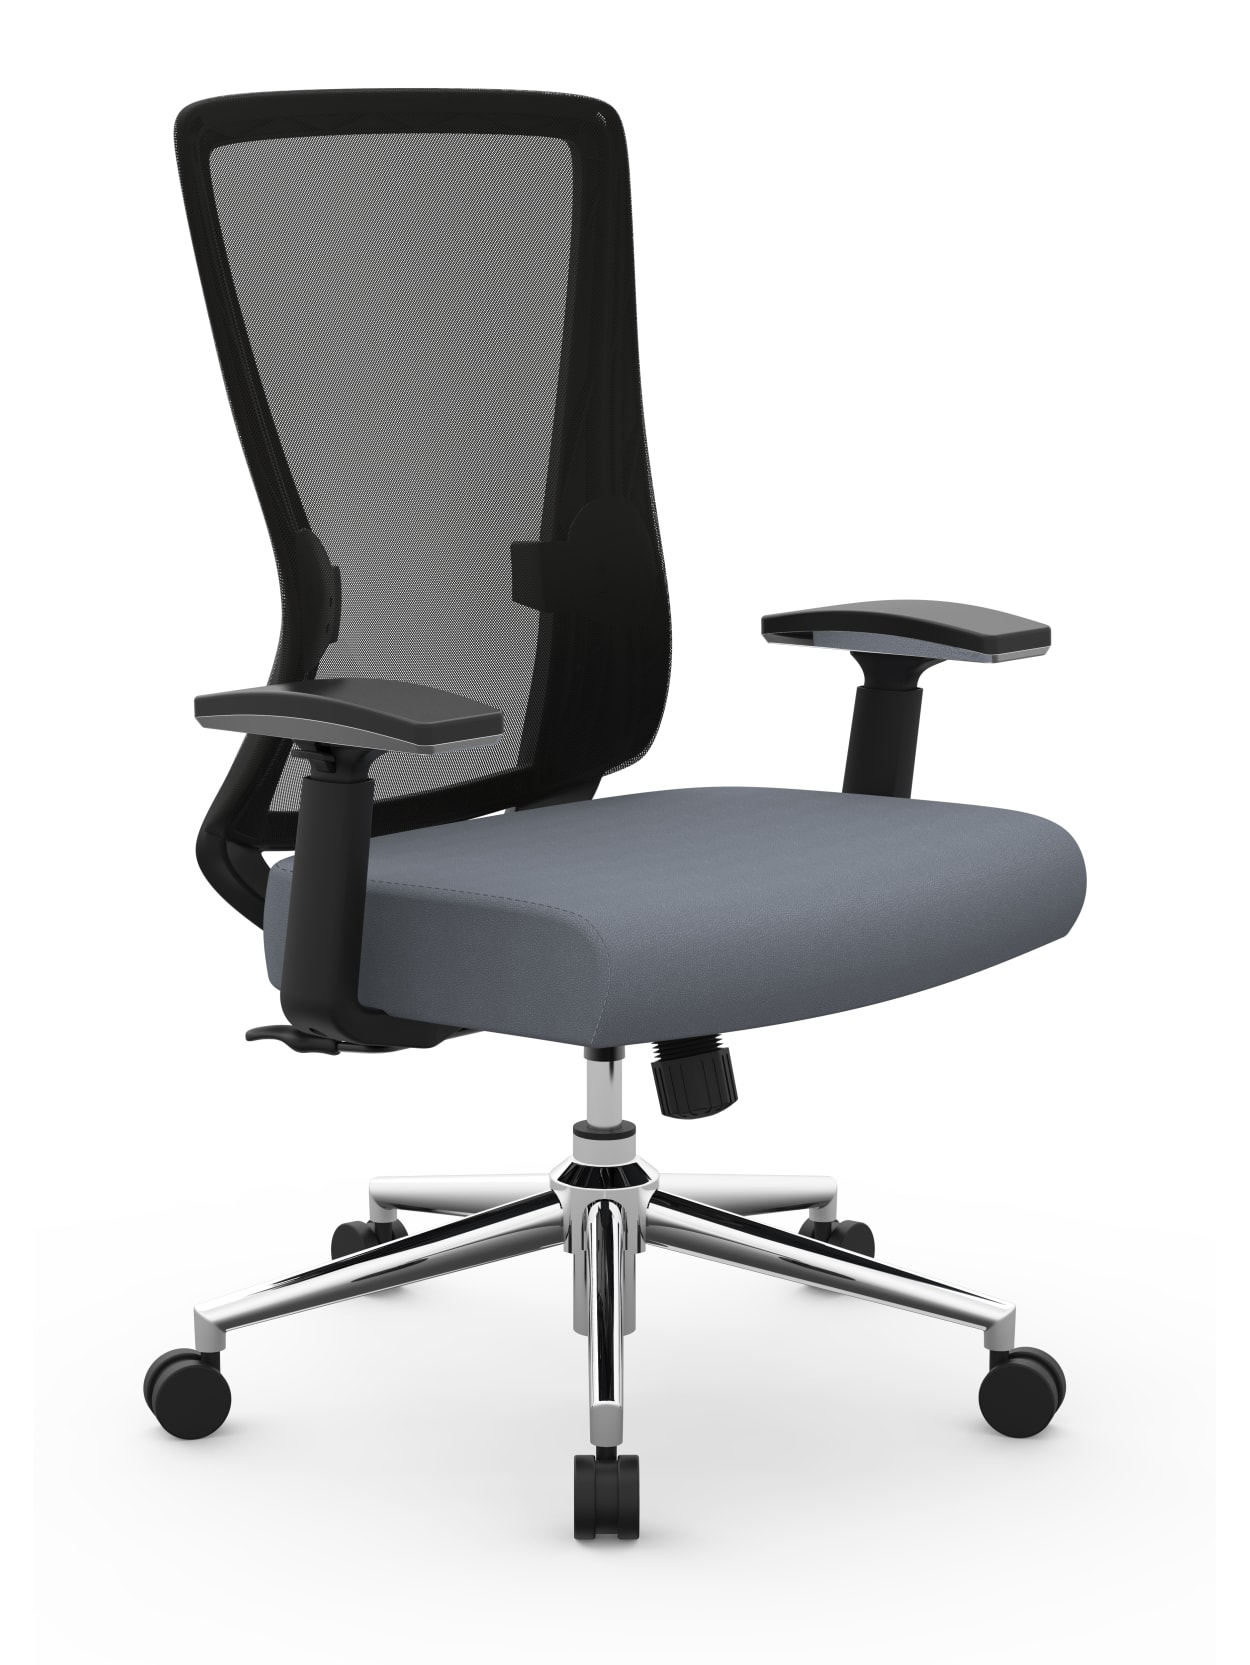 Realspace levari task chair instructions